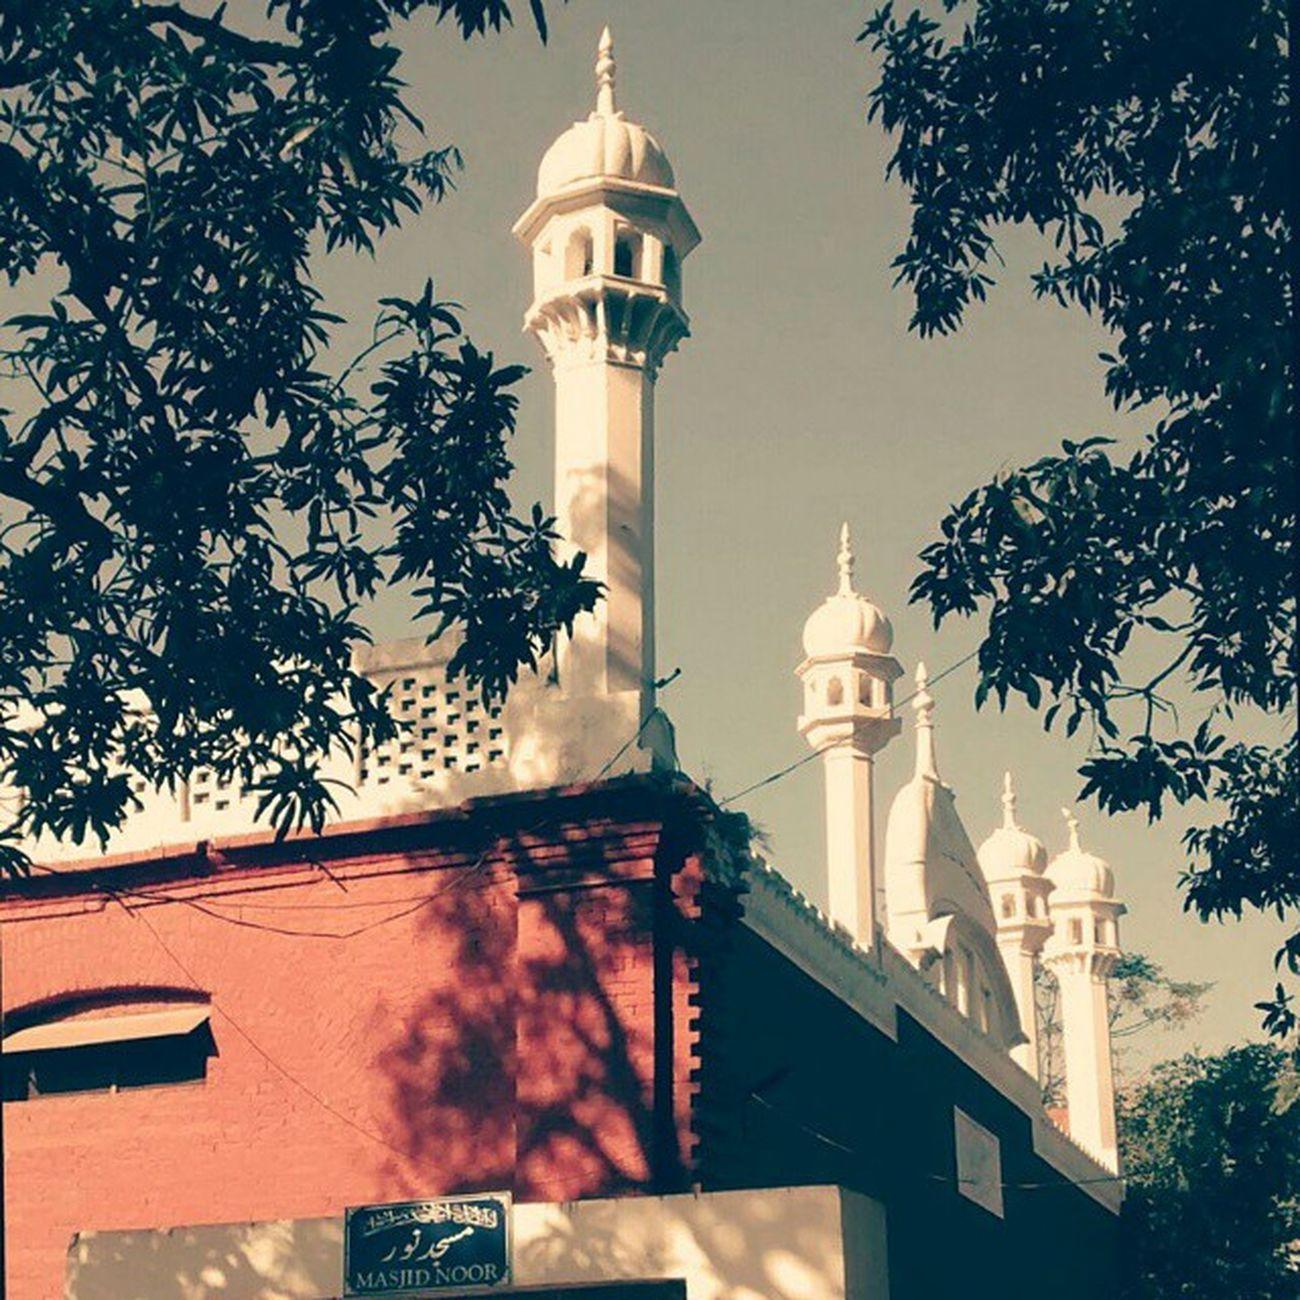 Masjid_Noor Darul_Islam_Kothi 😃 Missinghome 😢😢 Qadian